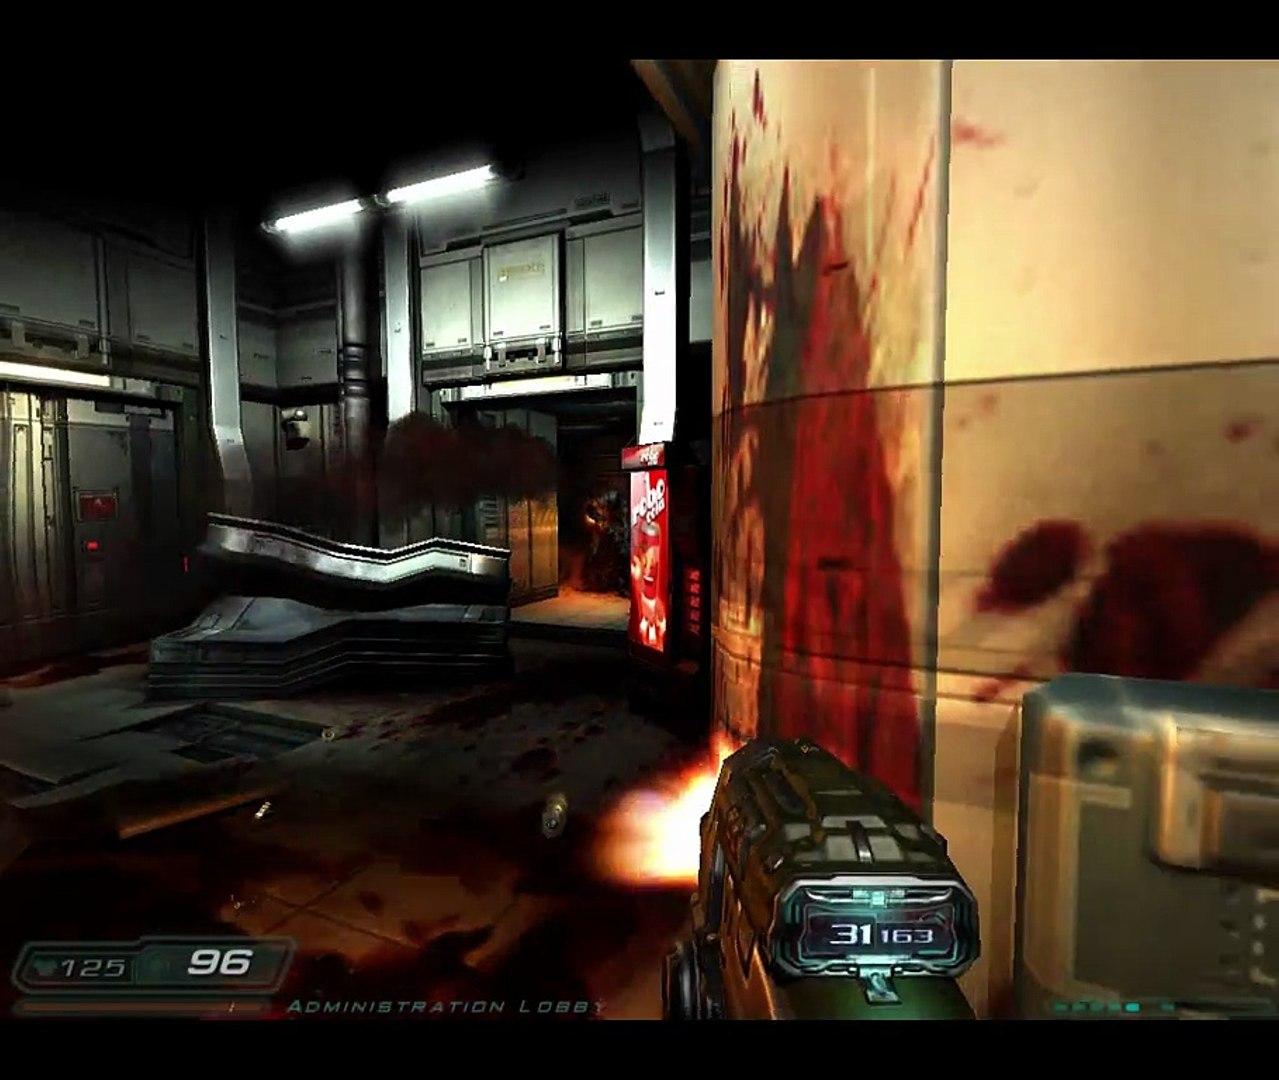 Doom 3 Gamepad Testing using Several KB+M Programs